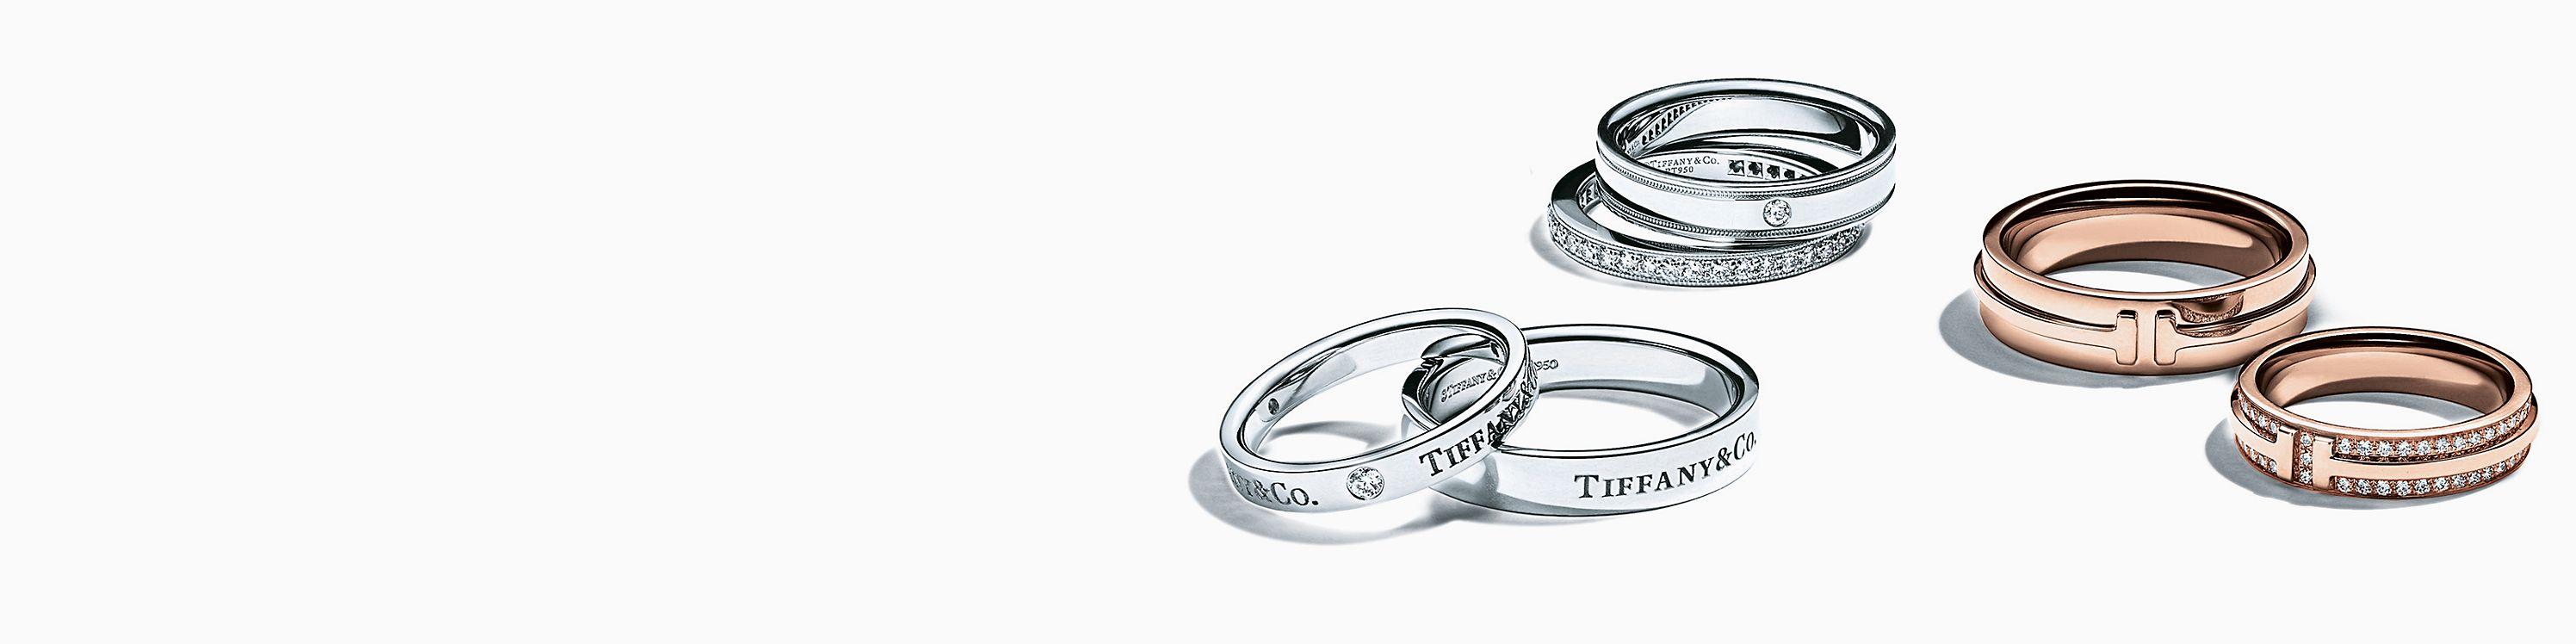 Shop Tiffany & Co. Wedding Band Sets